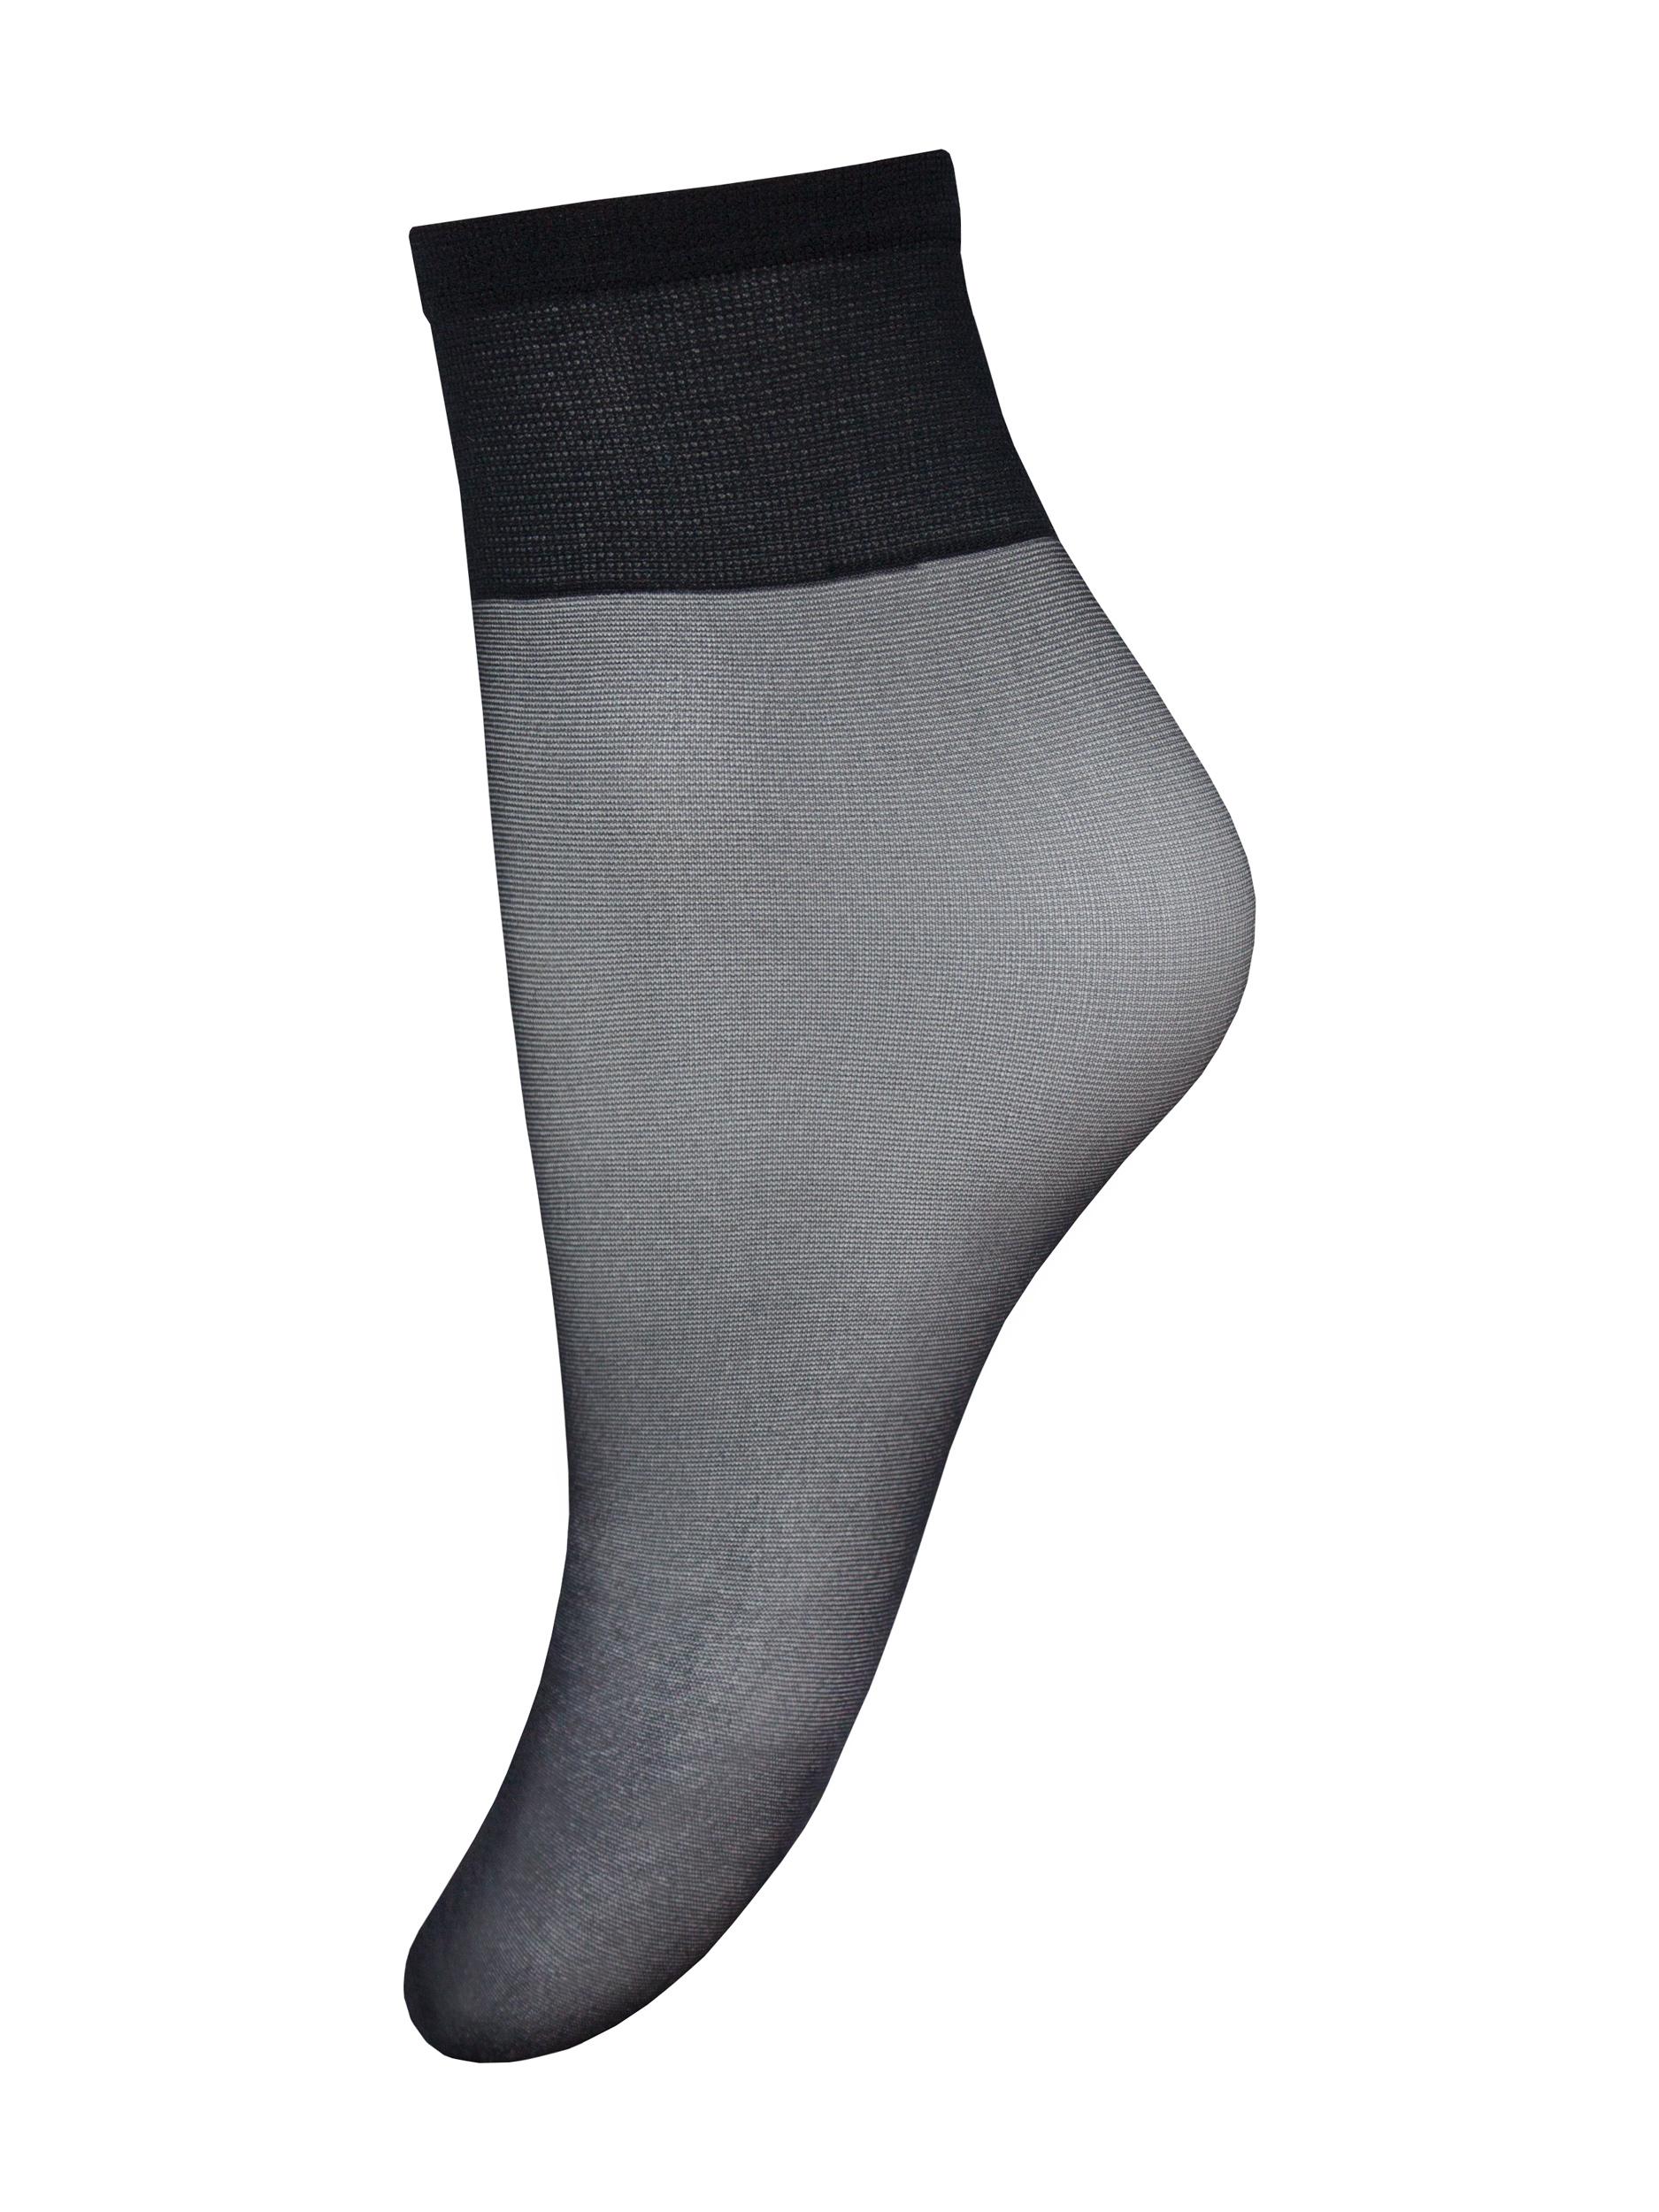 Капроновые носки женские Mademoiselle Silvia 20 (c.) 3 paia UNI nero (чёрные)